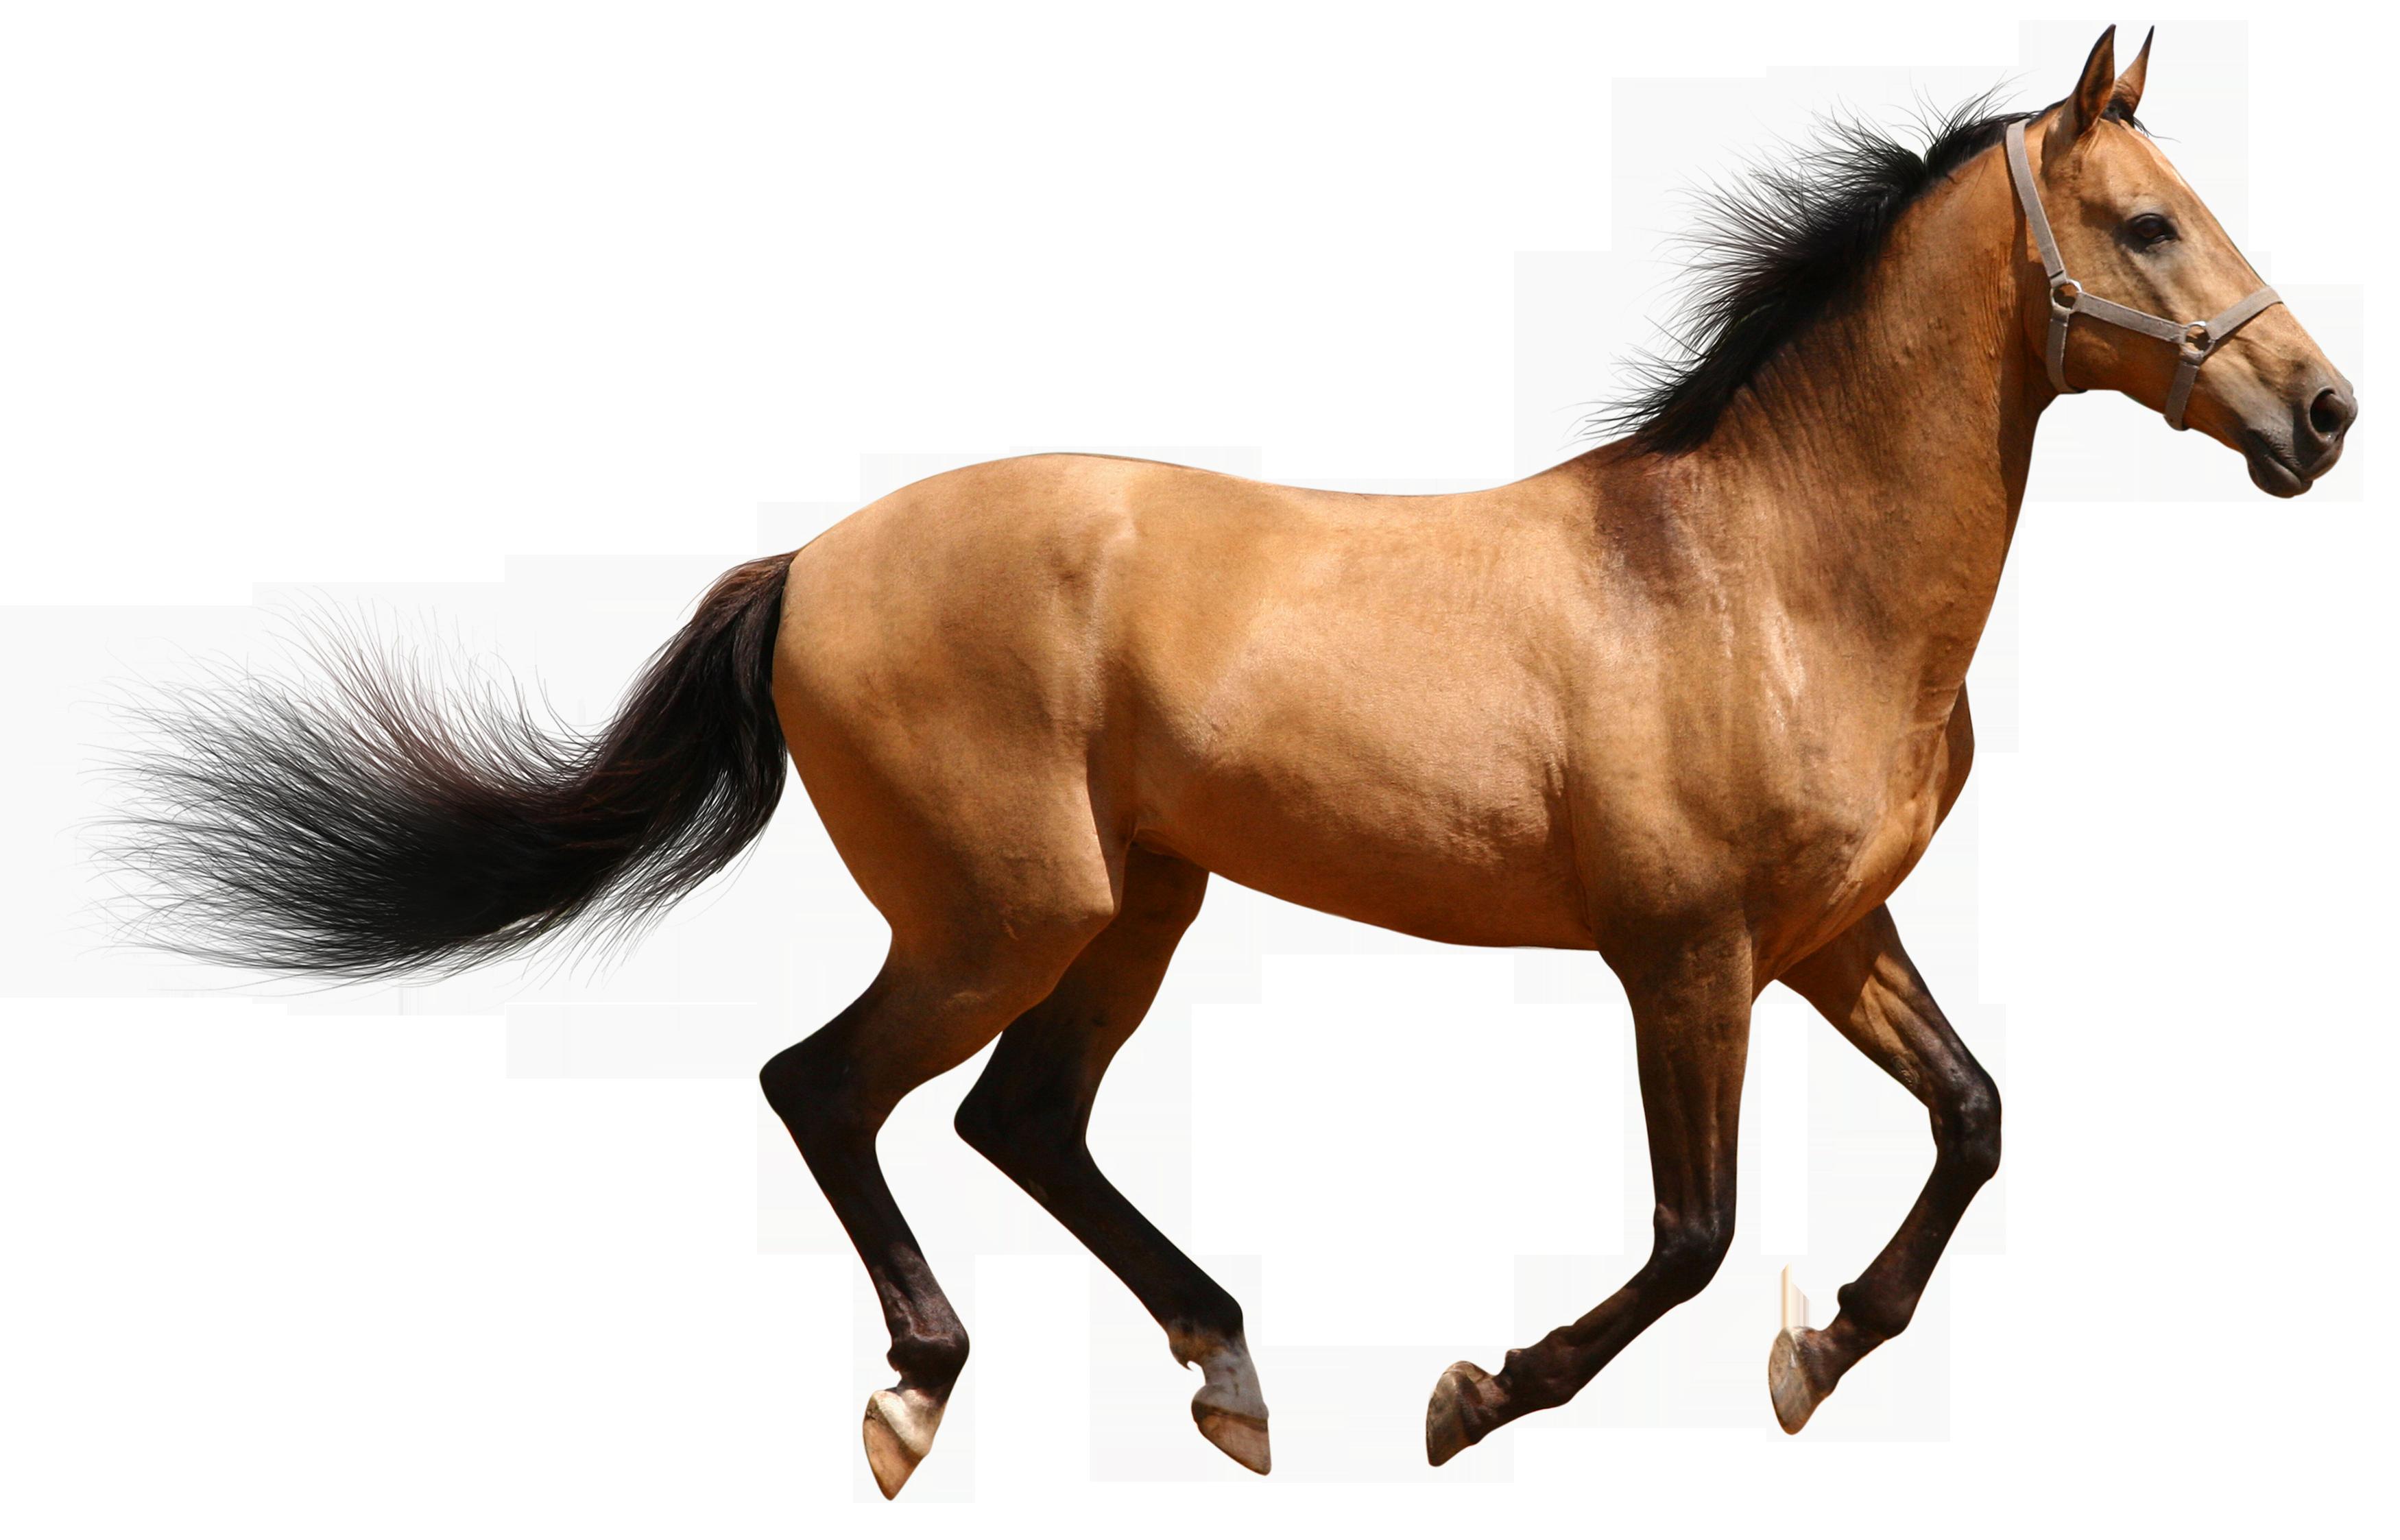 Horse HD PNG Transparent Horse HD.PNG Images..